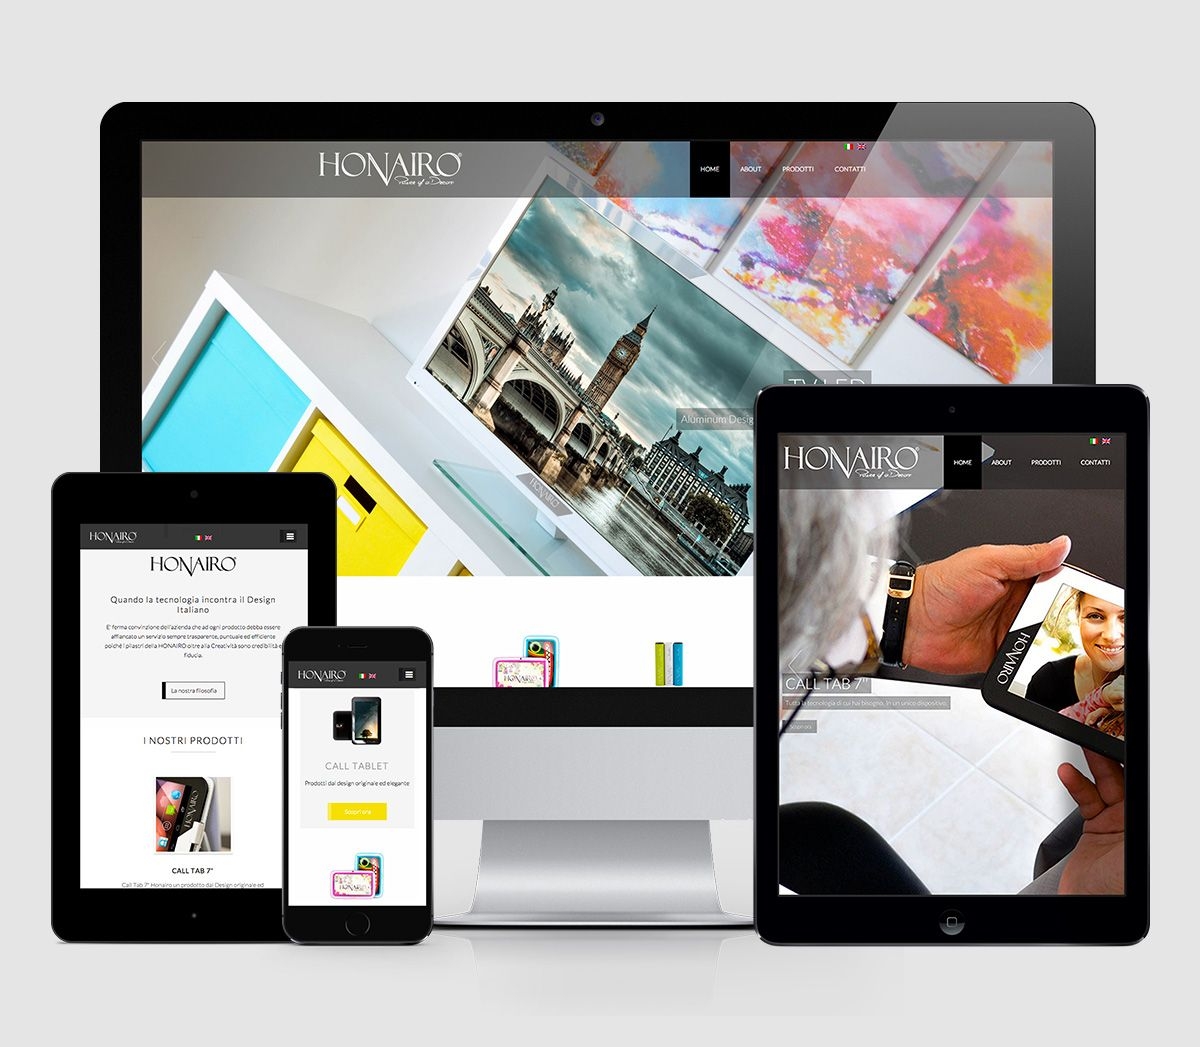 Honairo #website #web #webdesign #webdevelopment #layout #responsive #html #mrapps #honairo #technology